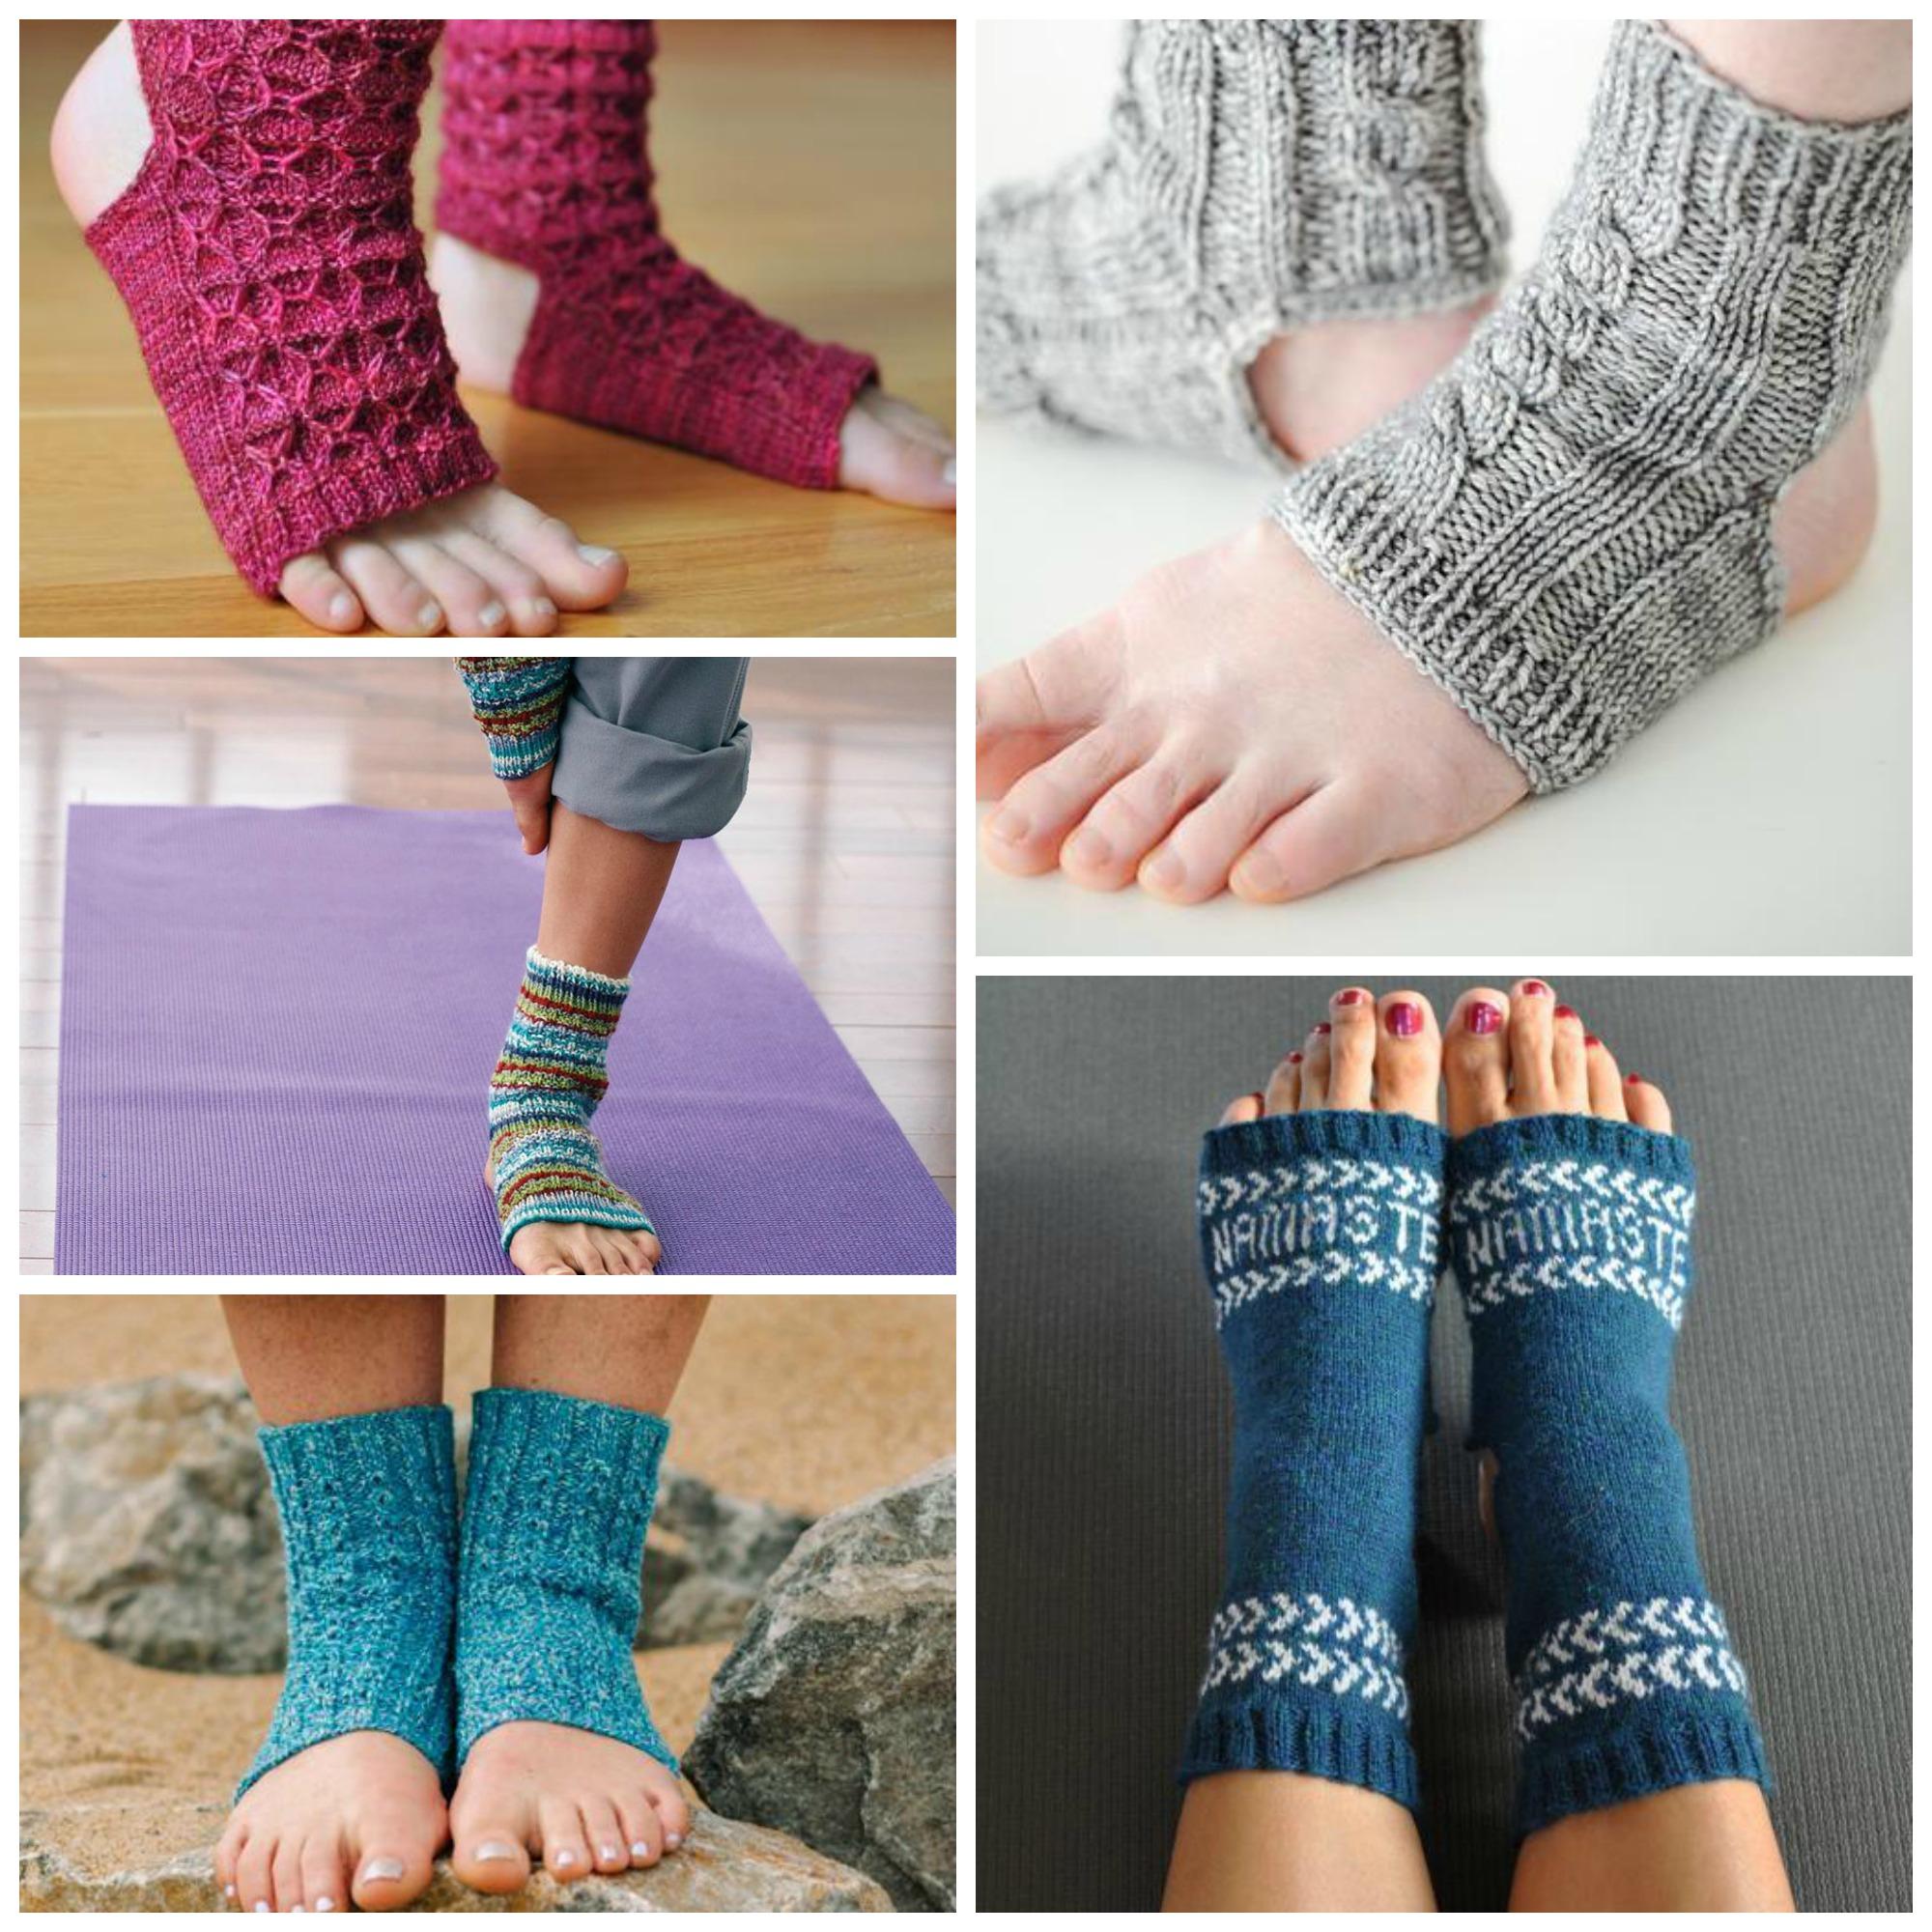 Knitting Pattern For Yoga Socks 10 Yoga Socks Knitting Patterns